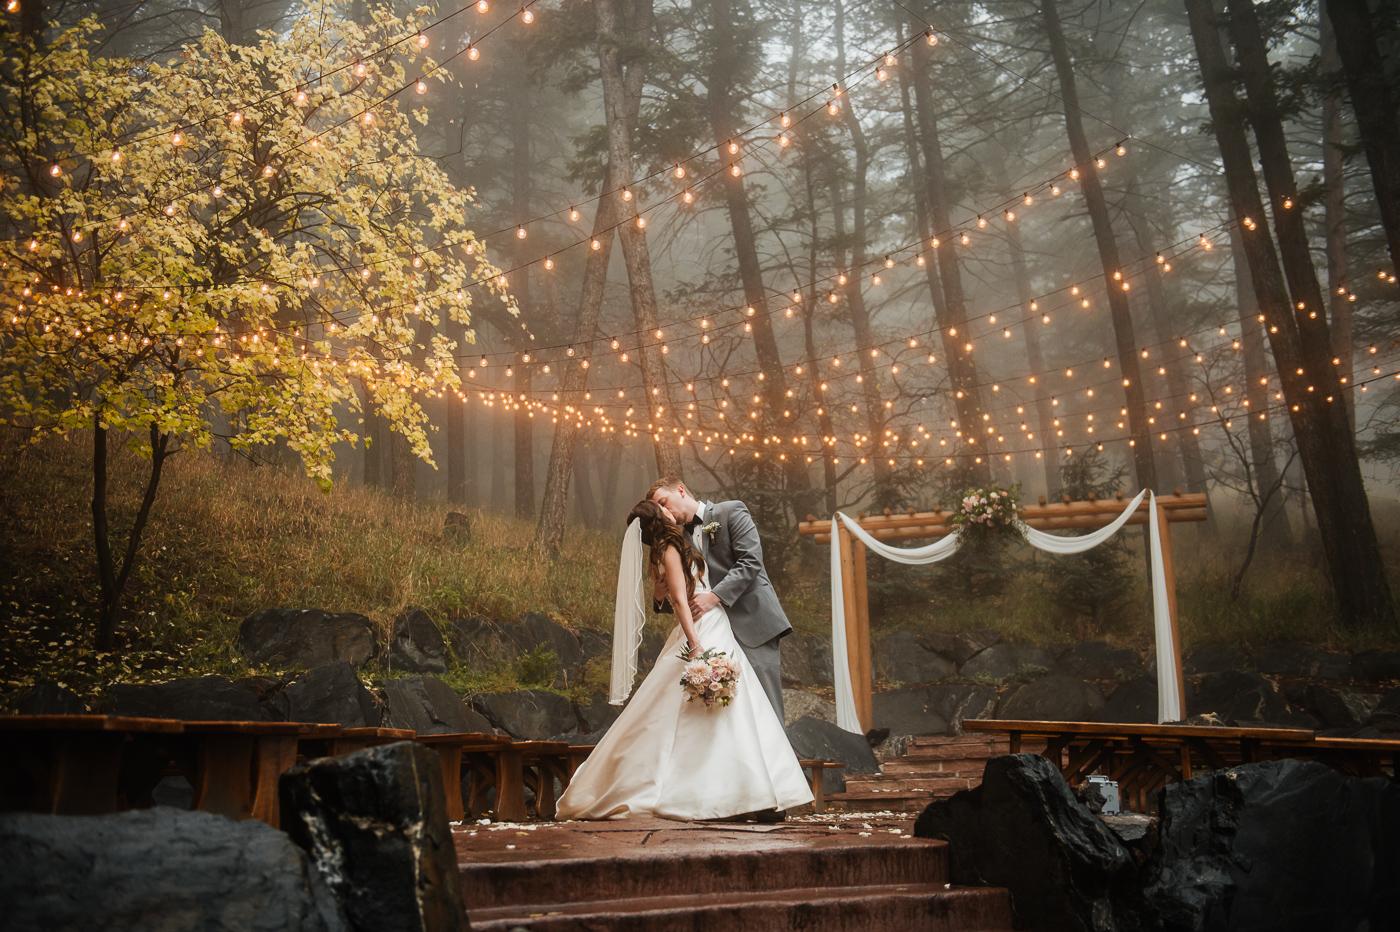 Candice Rawlin Wedding PHOCO Photography Pines Genesee Golden Colorado Fog -34.jpg